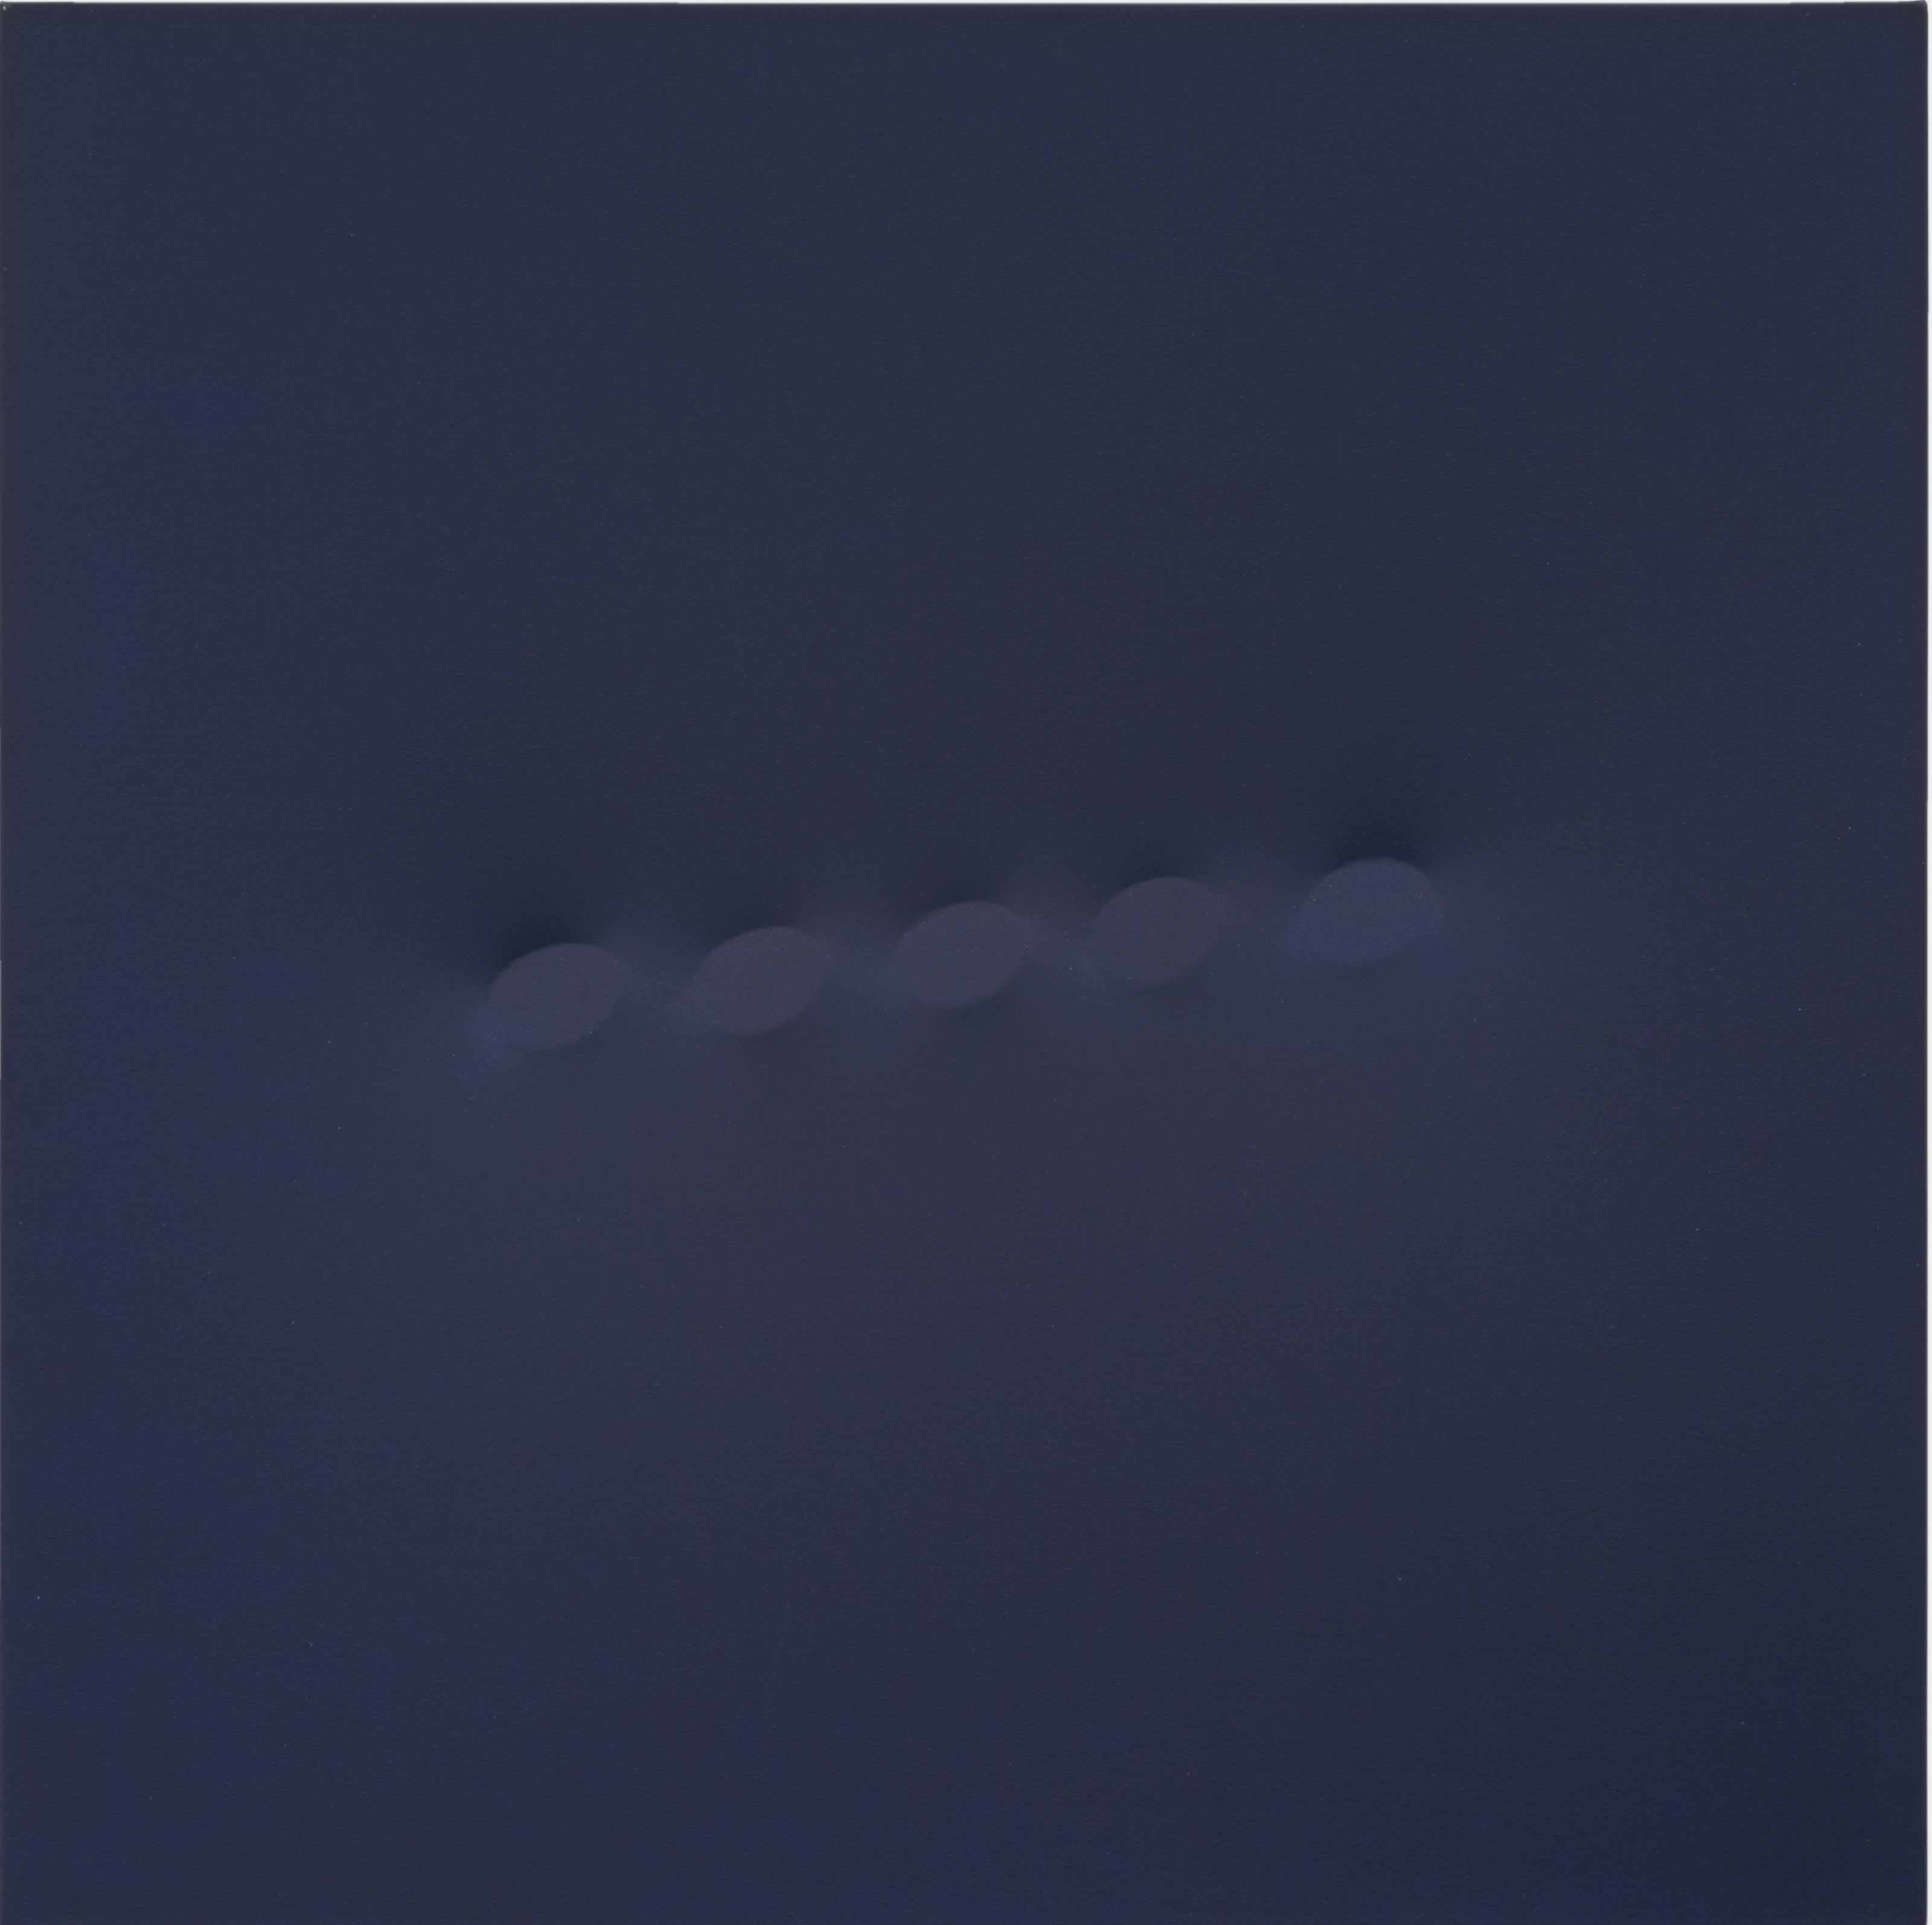 Cinque ovali blu